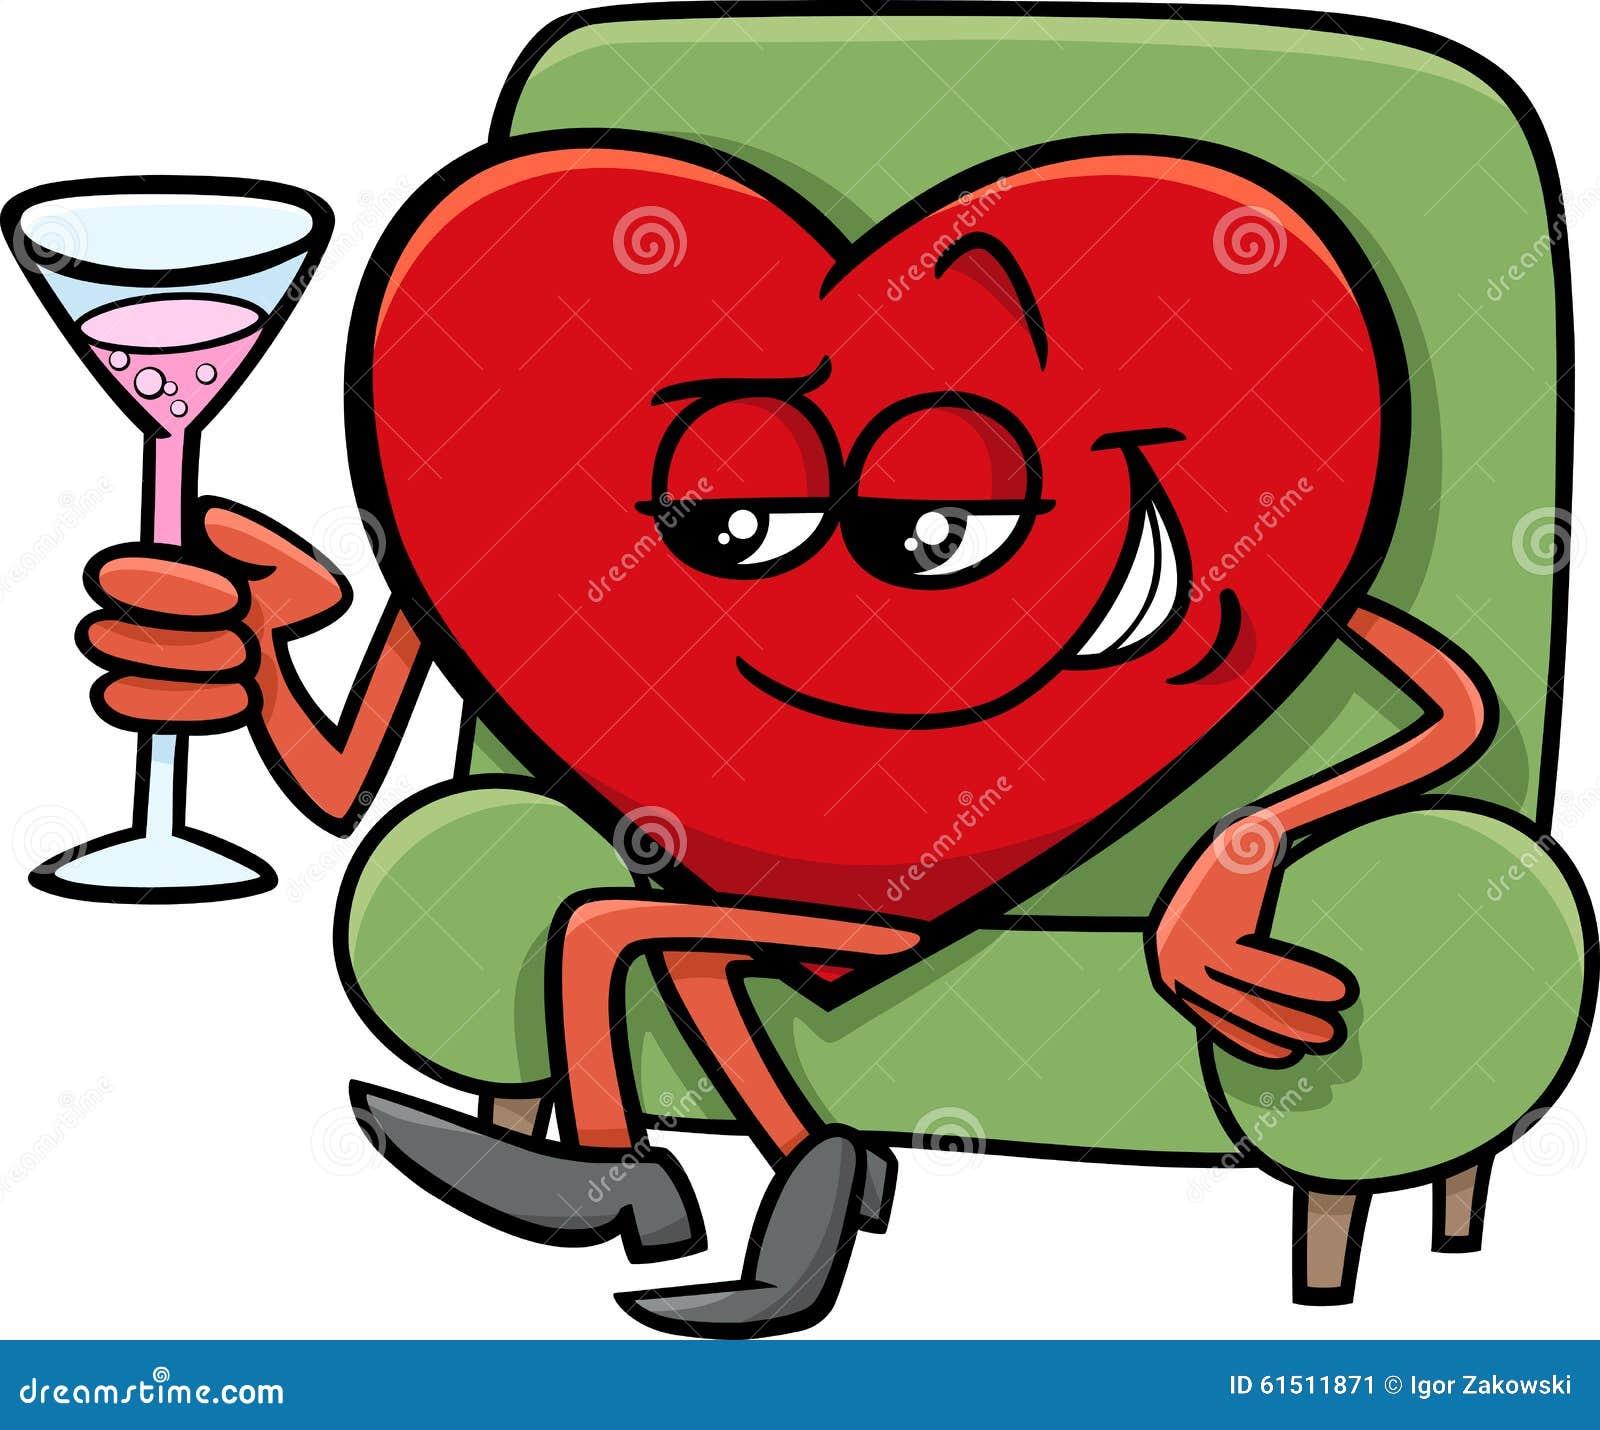 Cartoon Characters Valentines Day : Valentine heart cartoon character stock vector image